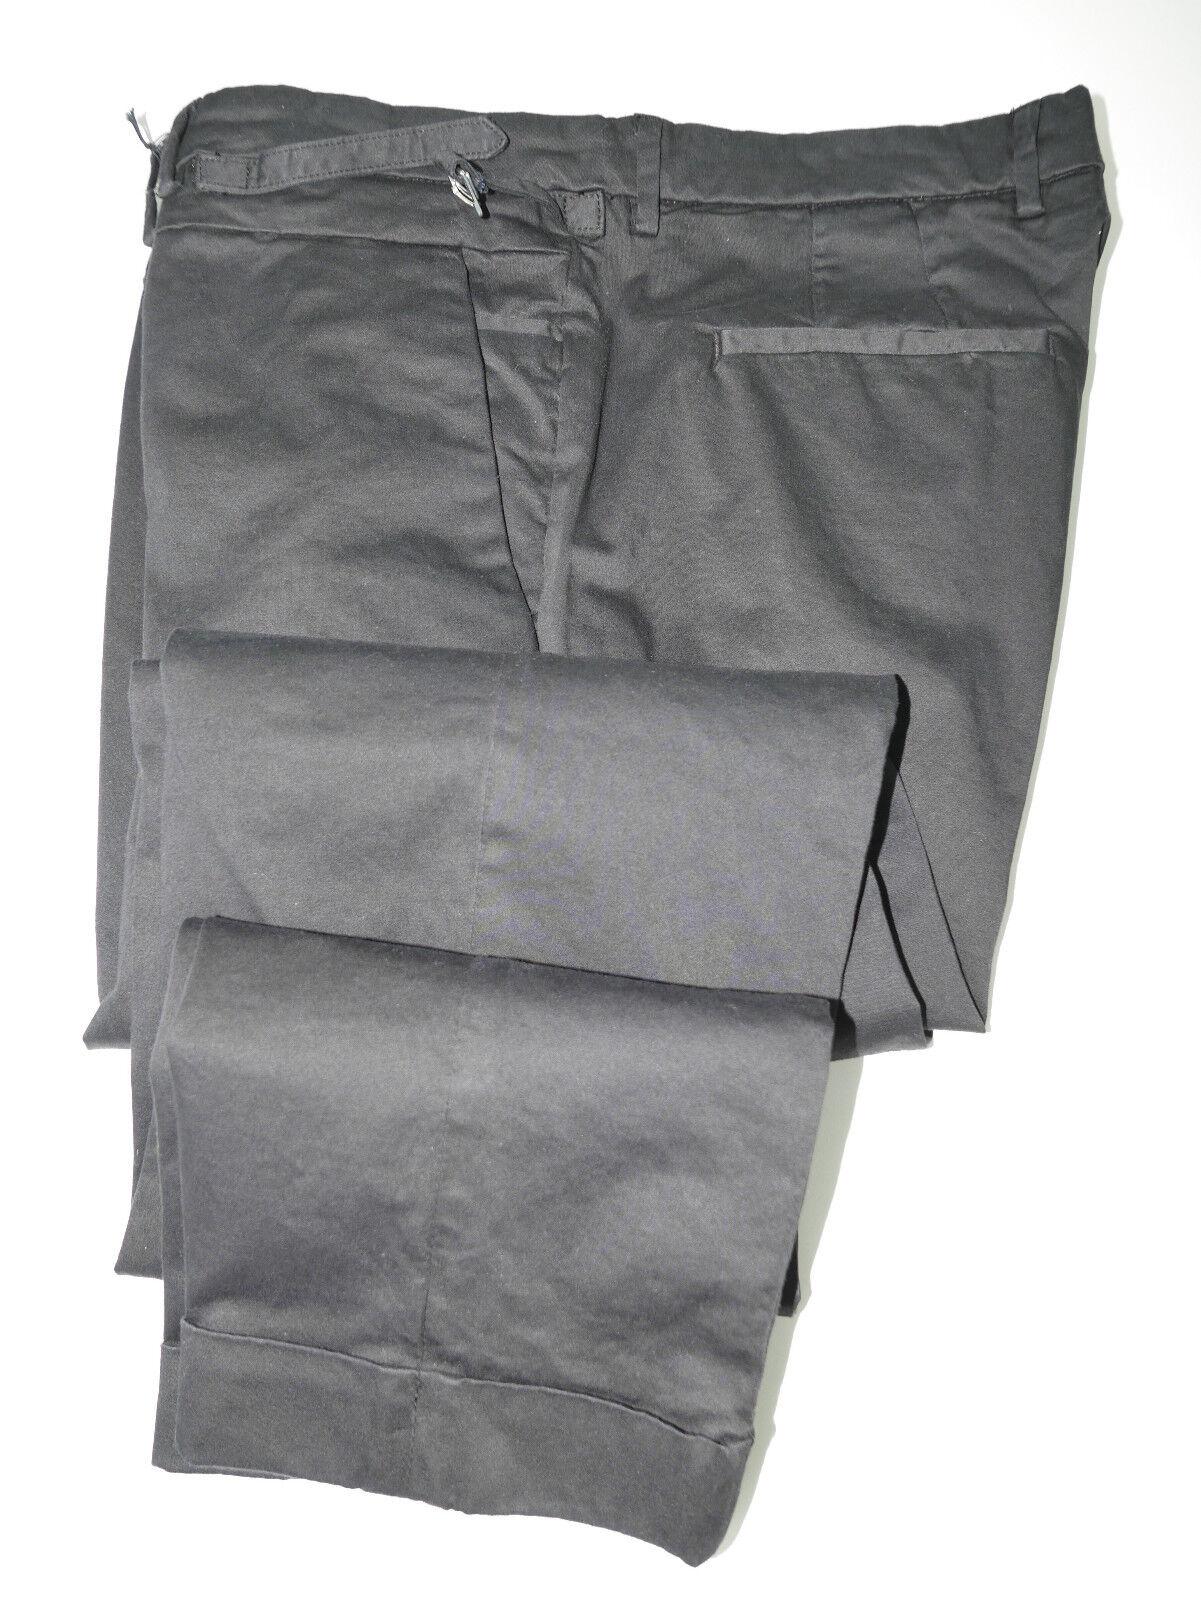 Gazzarrini Napoli 36 UK 52 EU Cotton SLIM Italian NWTs Pants Marco Hand Made